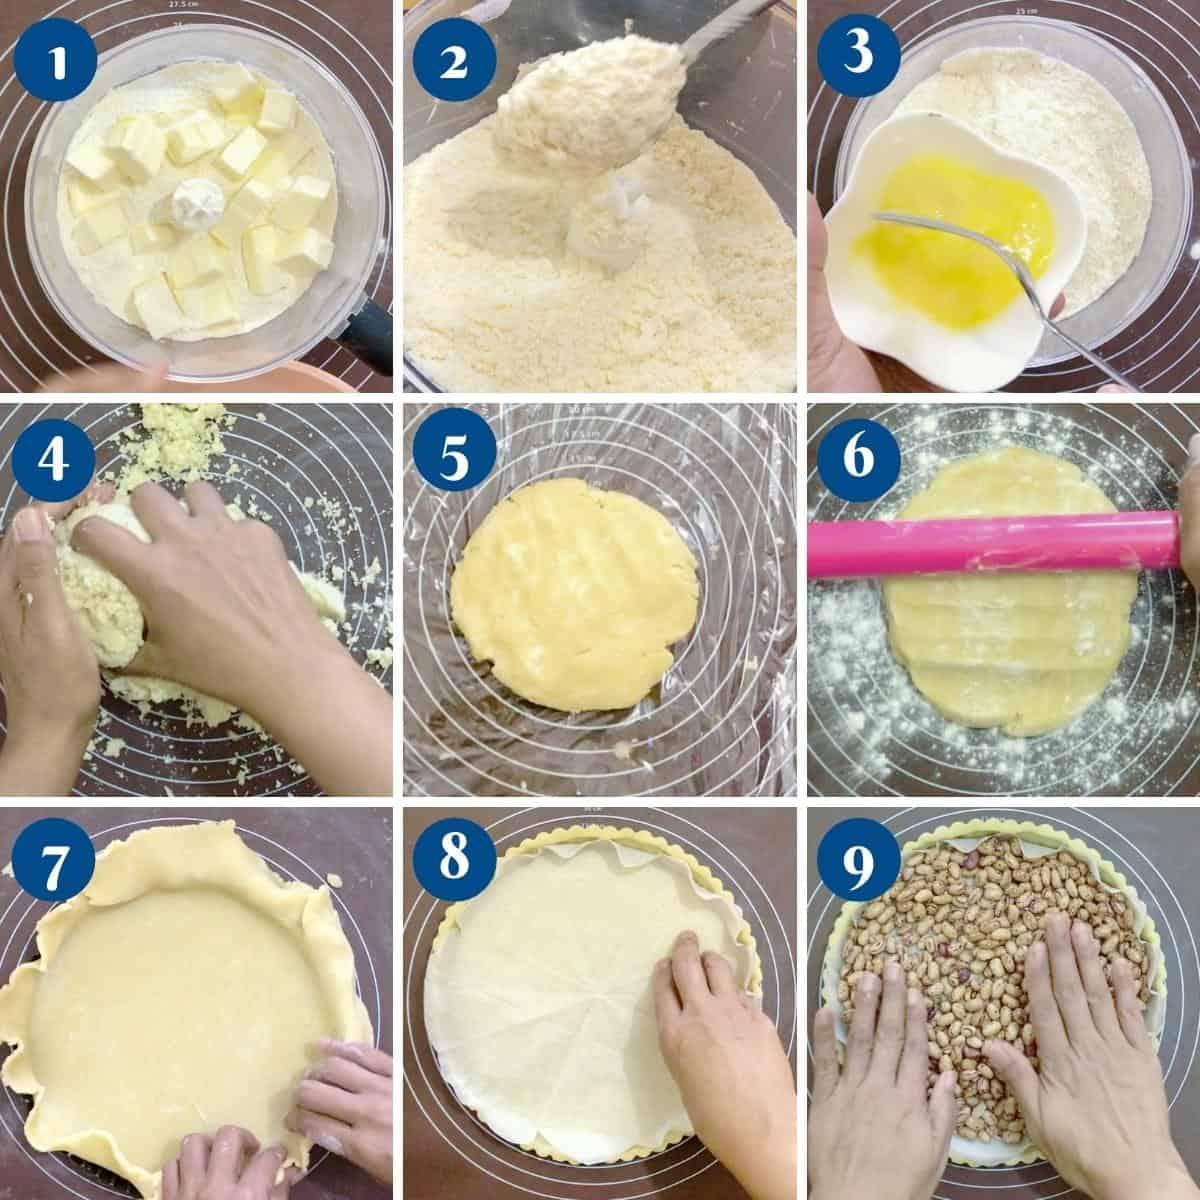 Progress pictures for quiche crust for mushroom quiche.